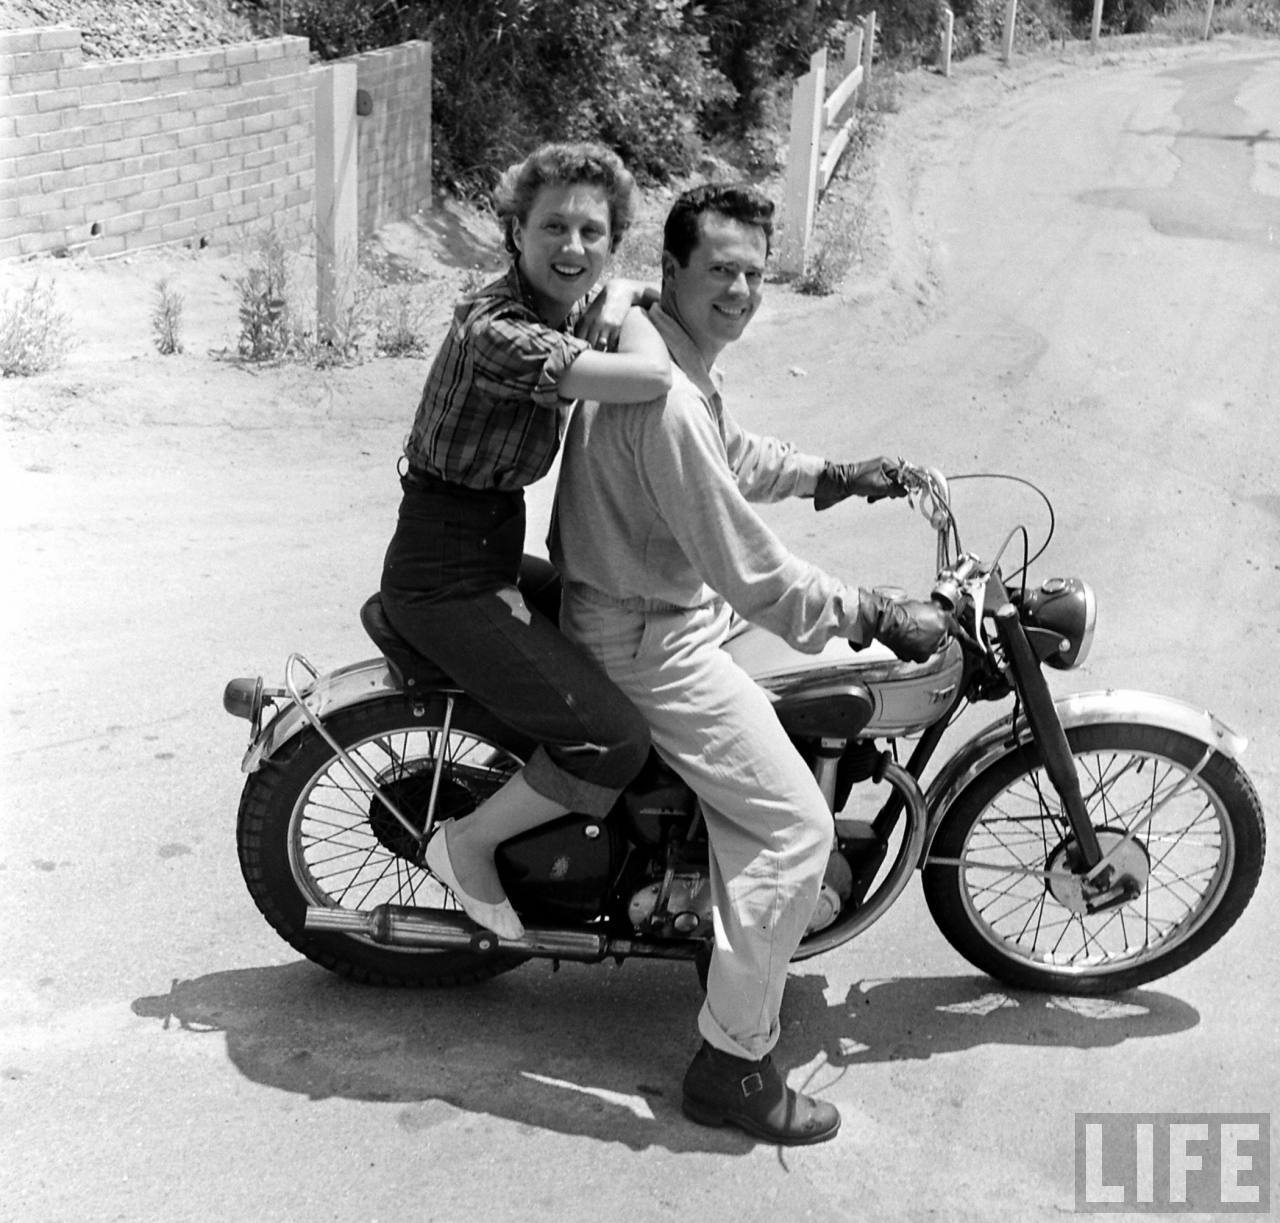 1940S Bike Girls Fascinating Photos Of Female -5707